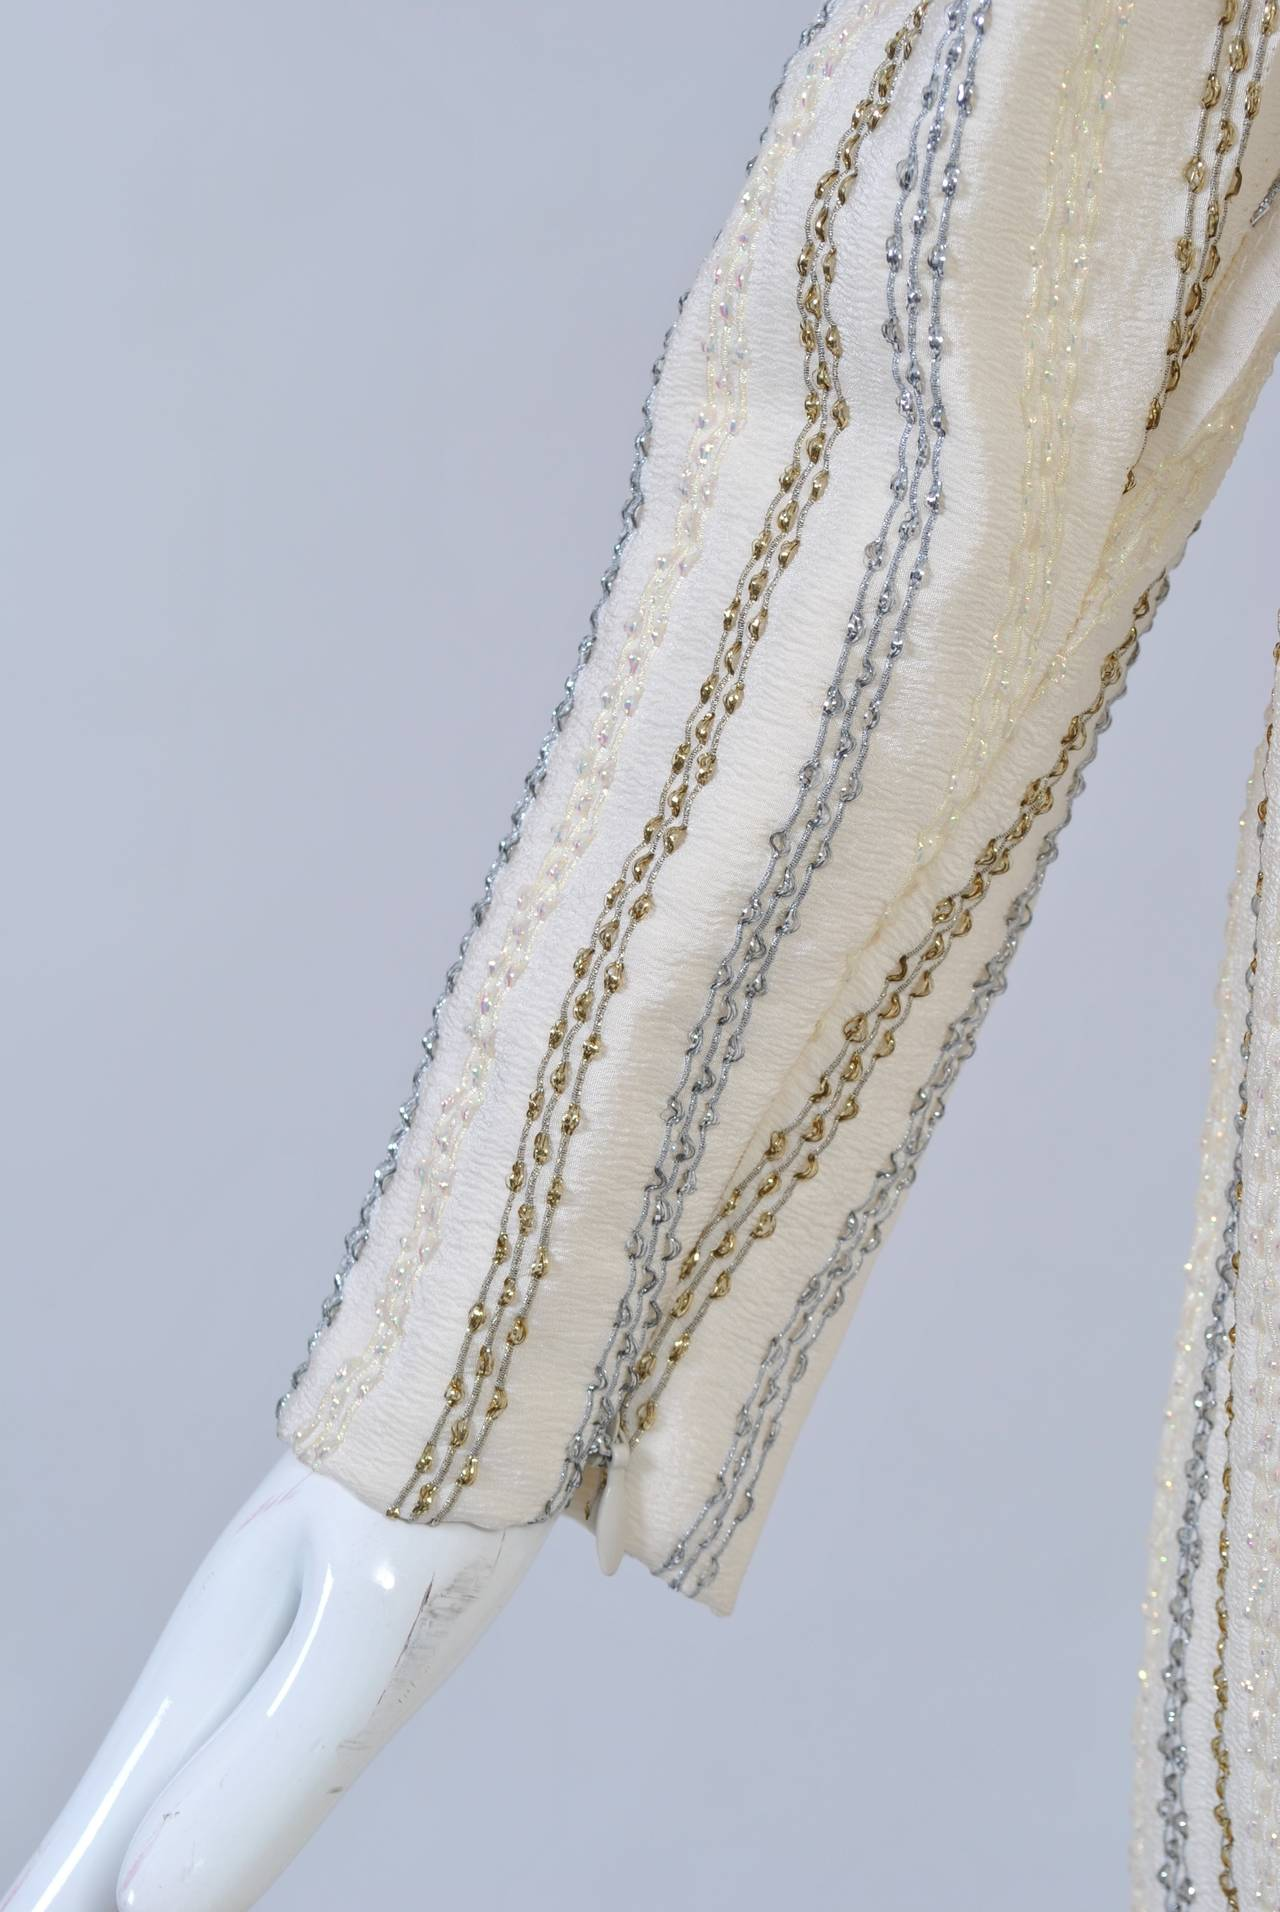 Carolina Herrera Ivory and Metallic Dress 6